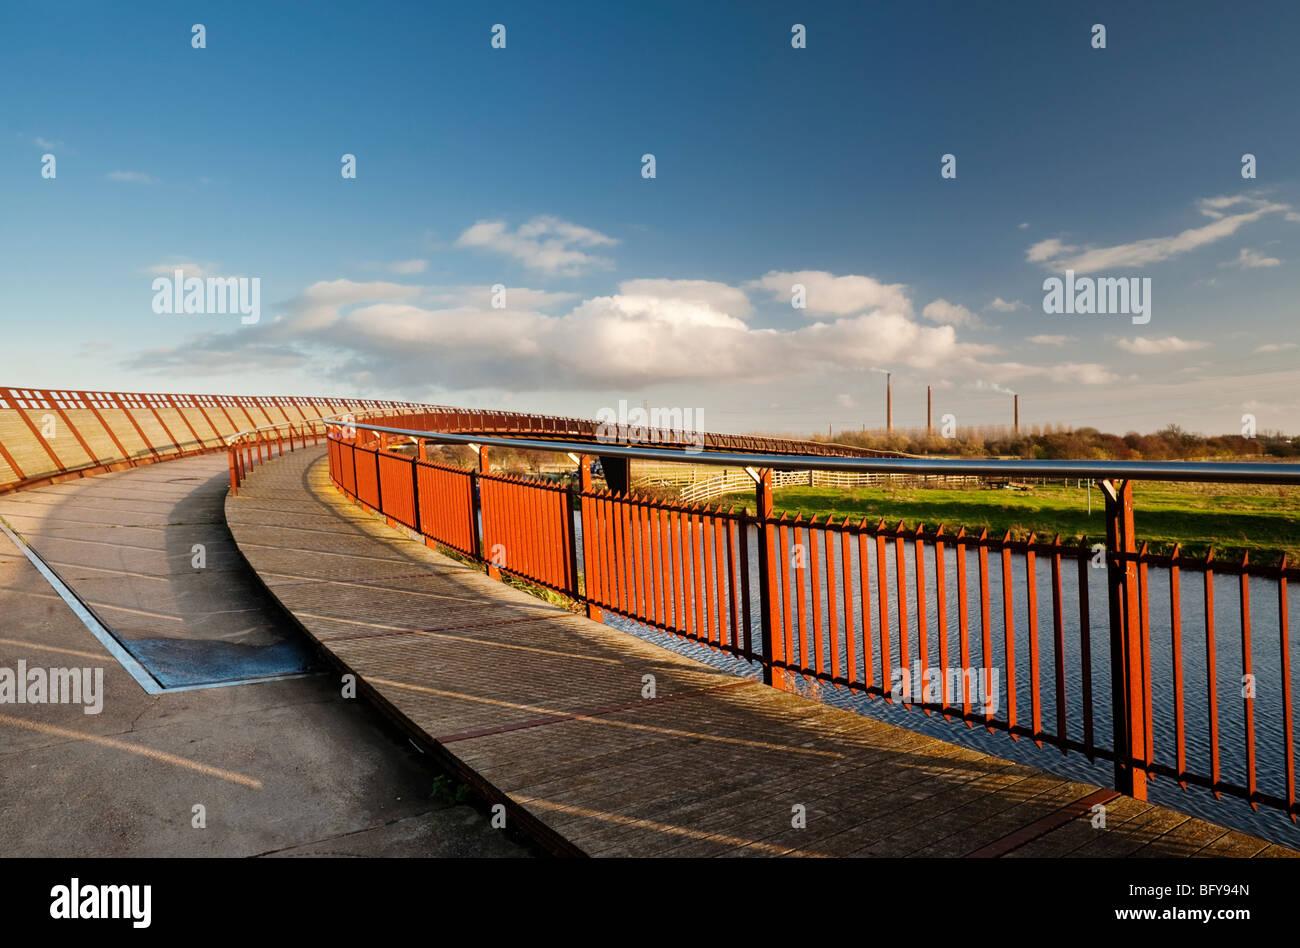 Shanks Millennium Bridge over the River Nene, east of Peterborough, Cambridgeshire, England - Stock Image